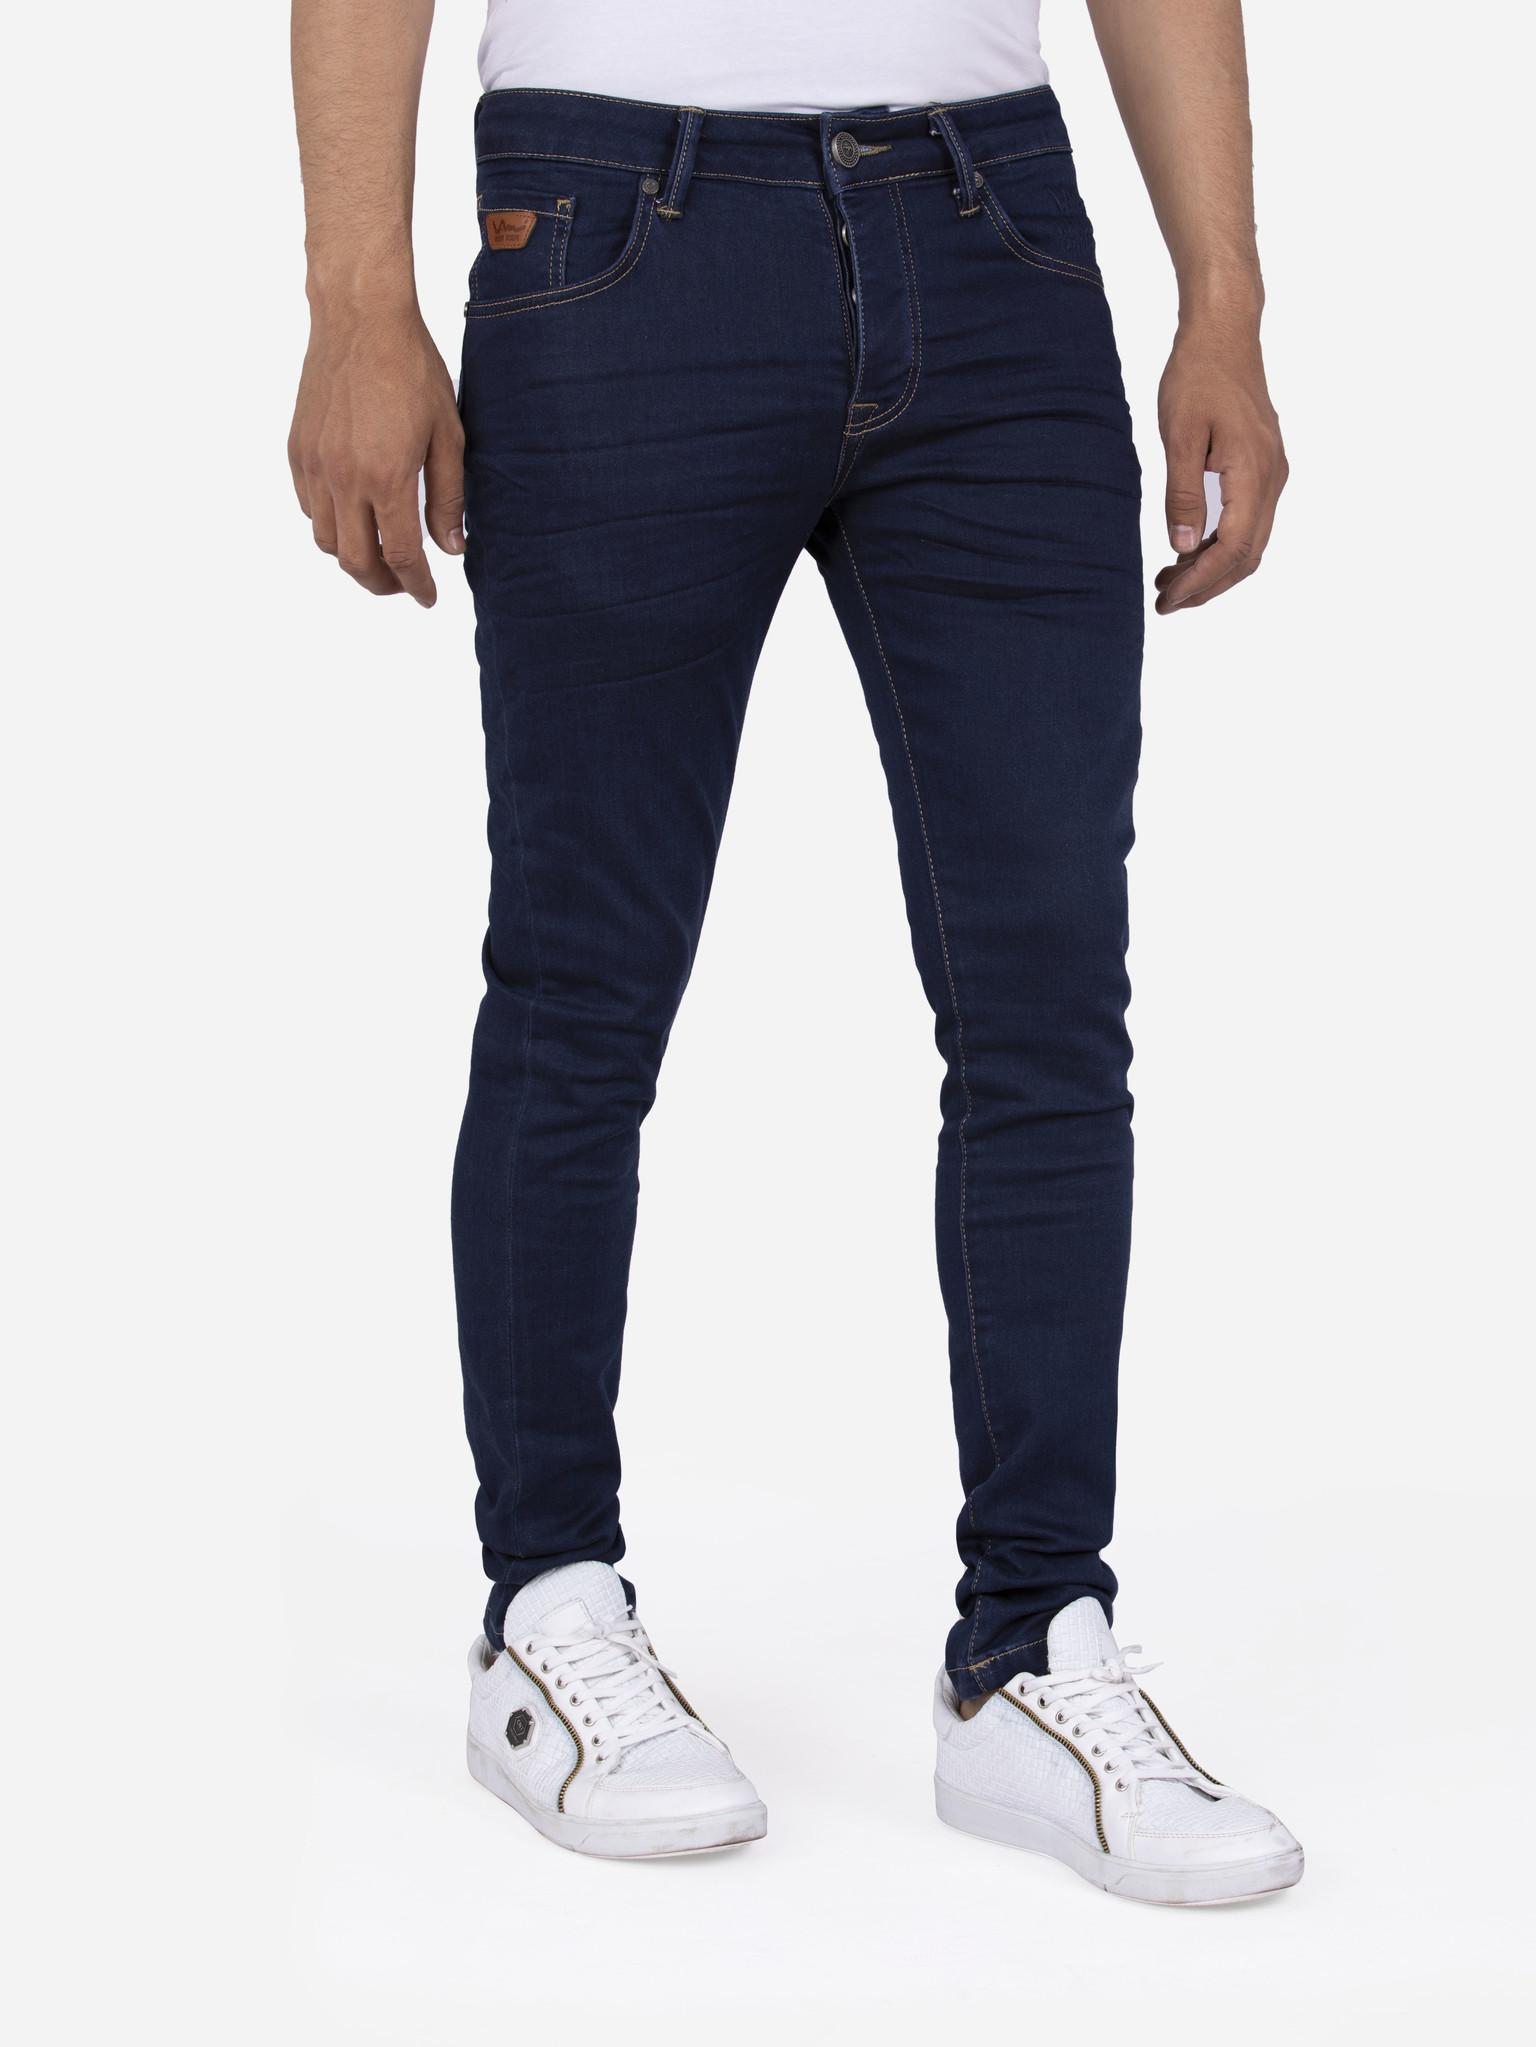 Wam Denim Jeans  33/32